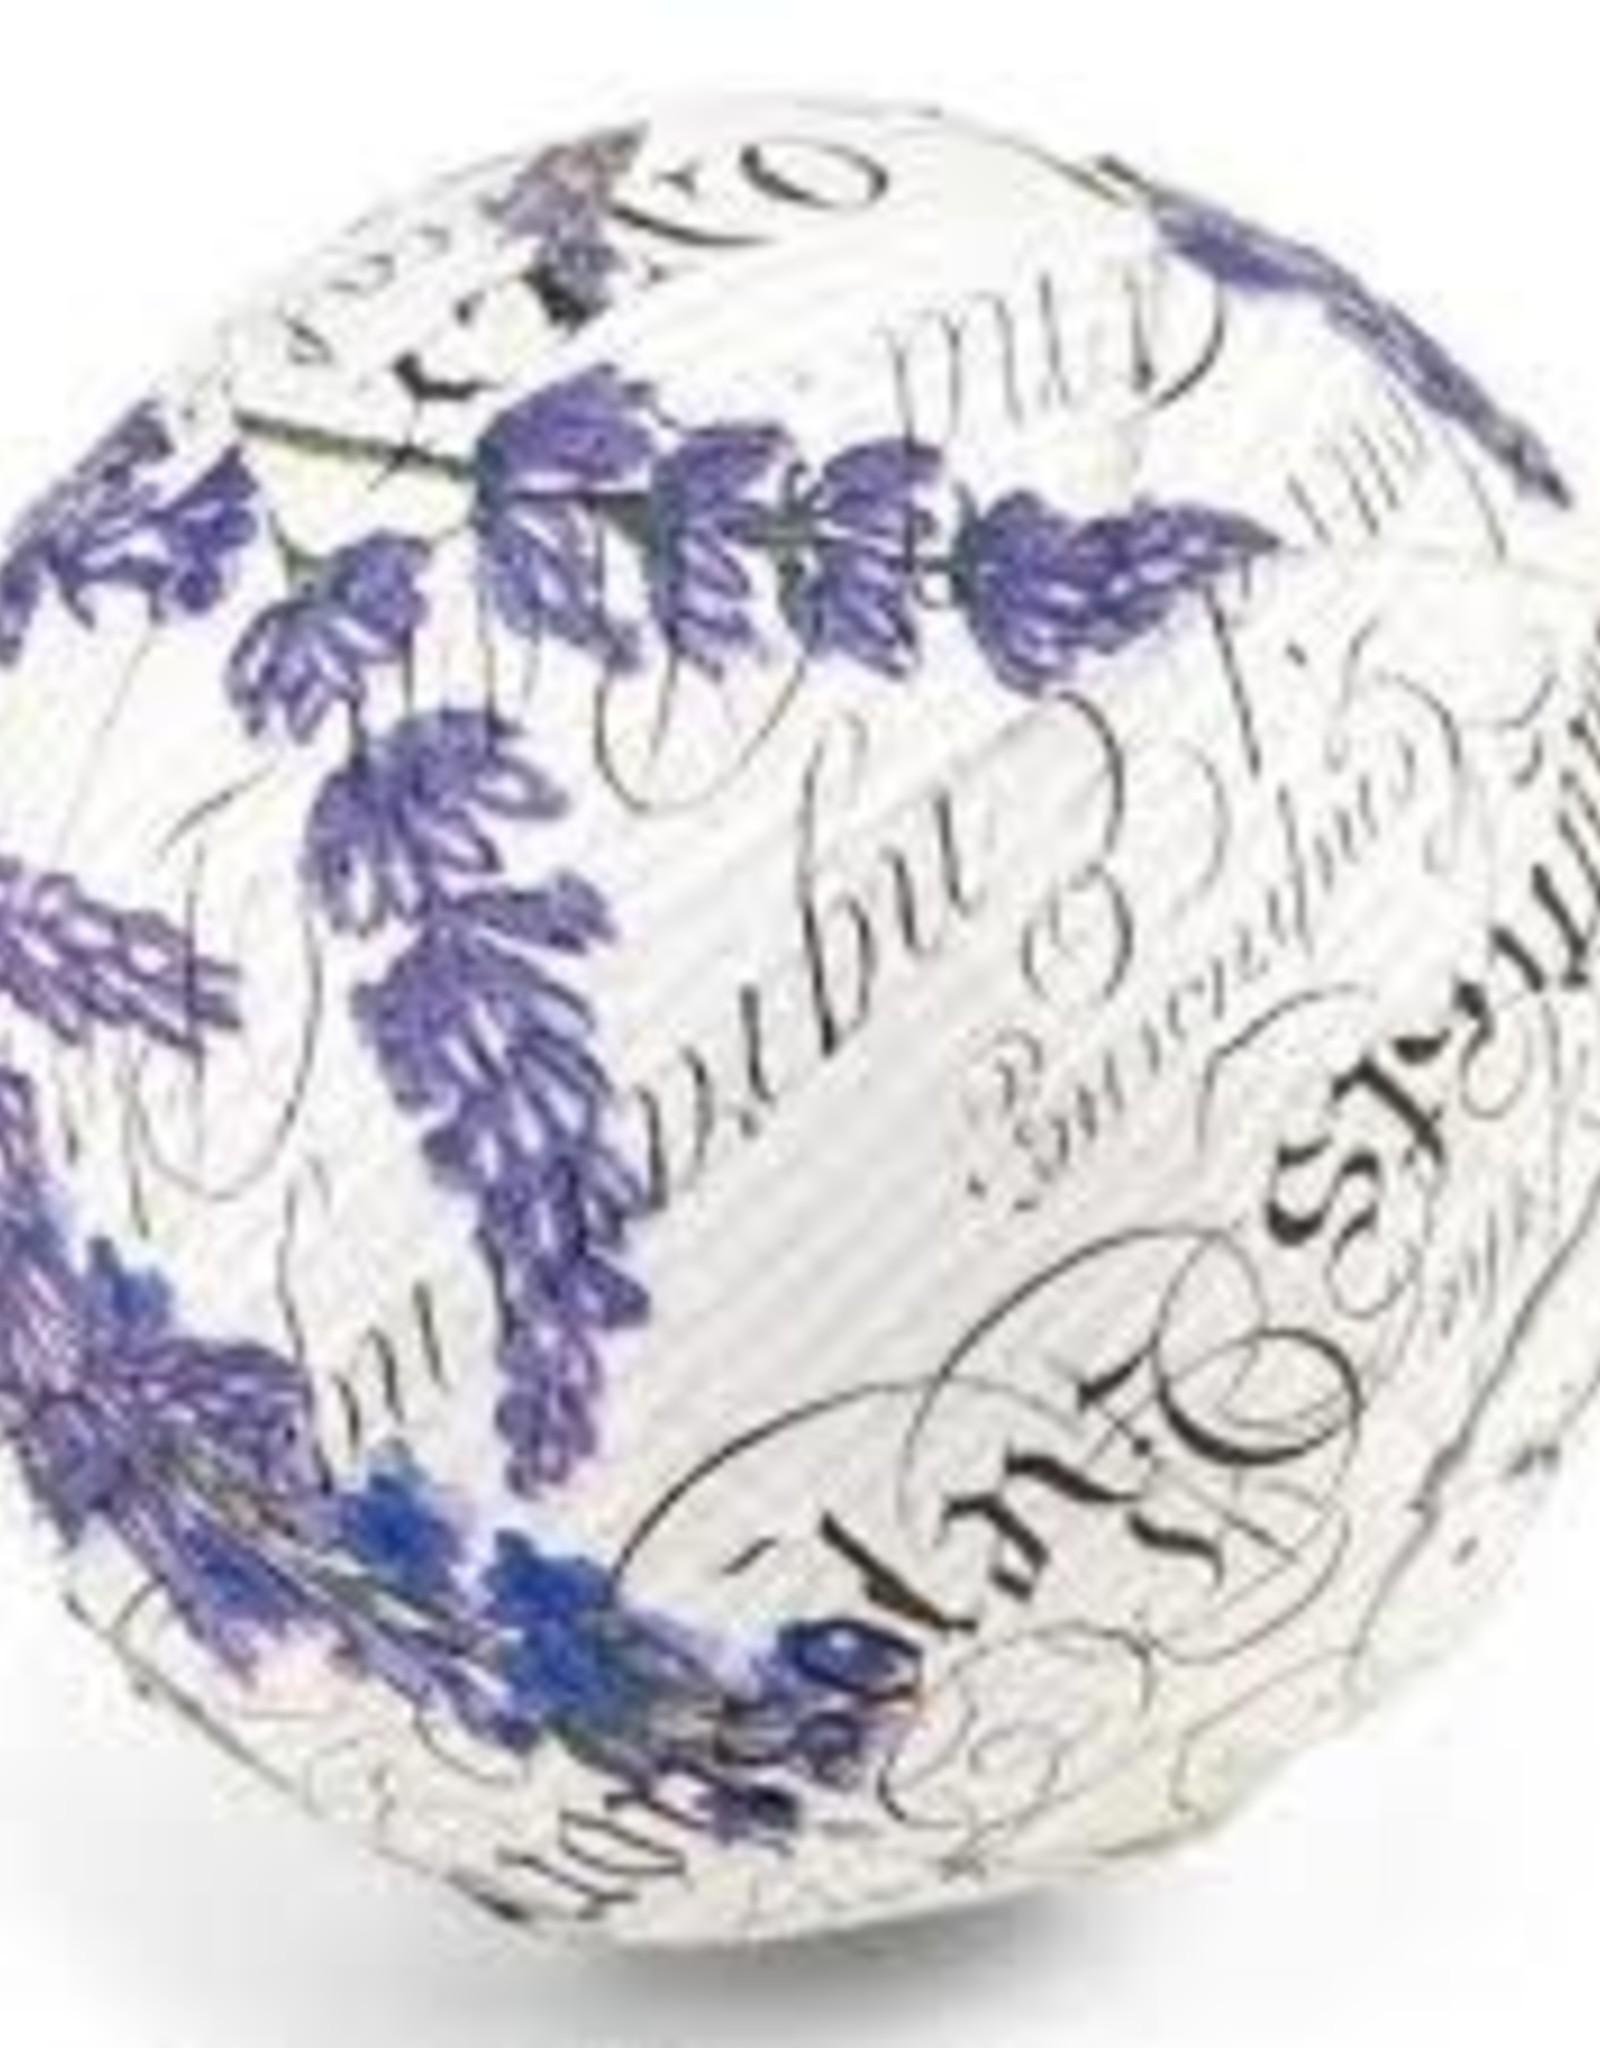 MichelDesign Works Lavender Bath Bomb